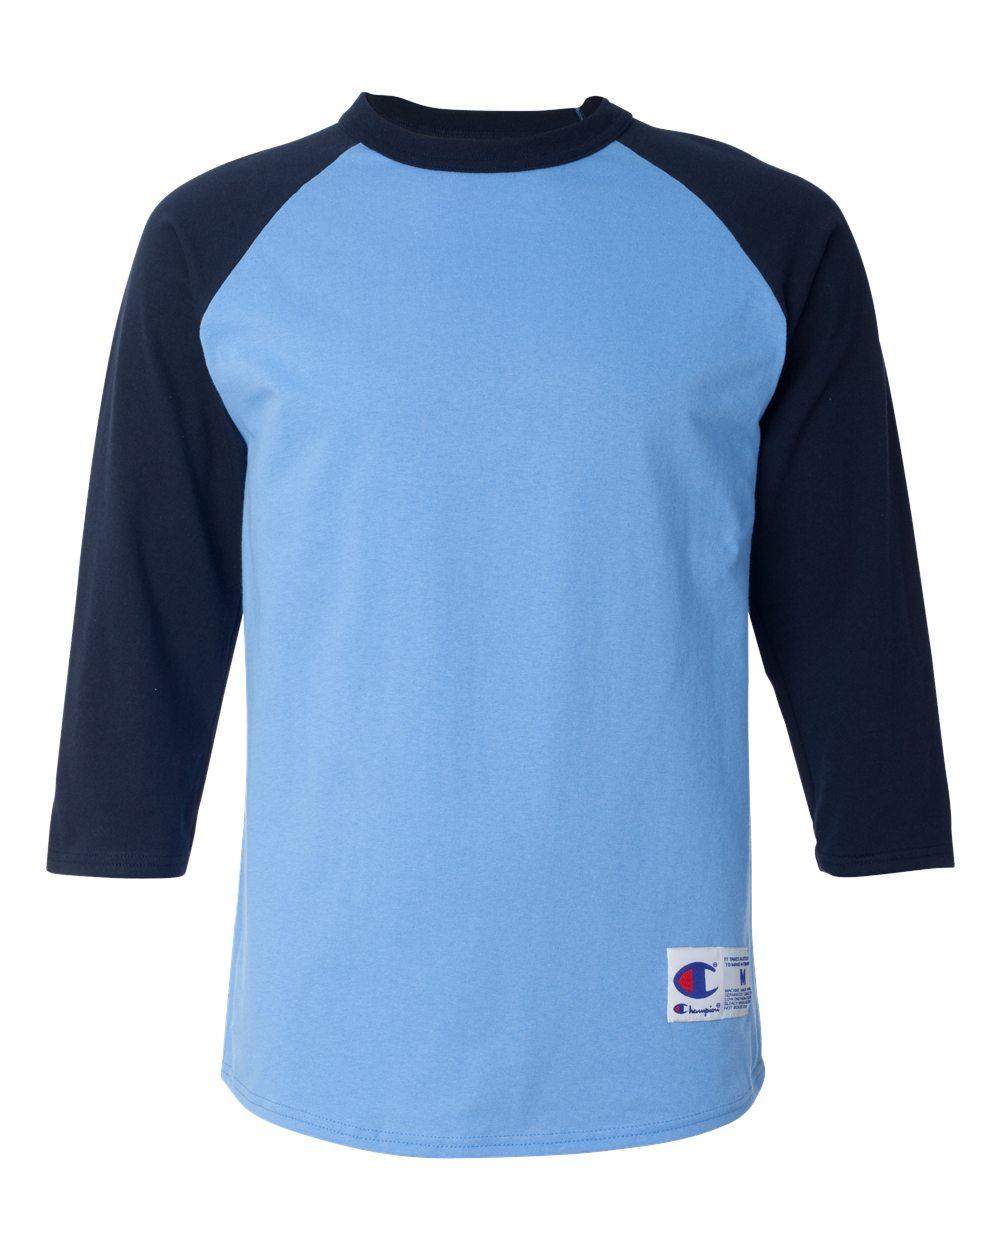 Champion T137 - Raglan Baseball T-Shirt   Needen USA